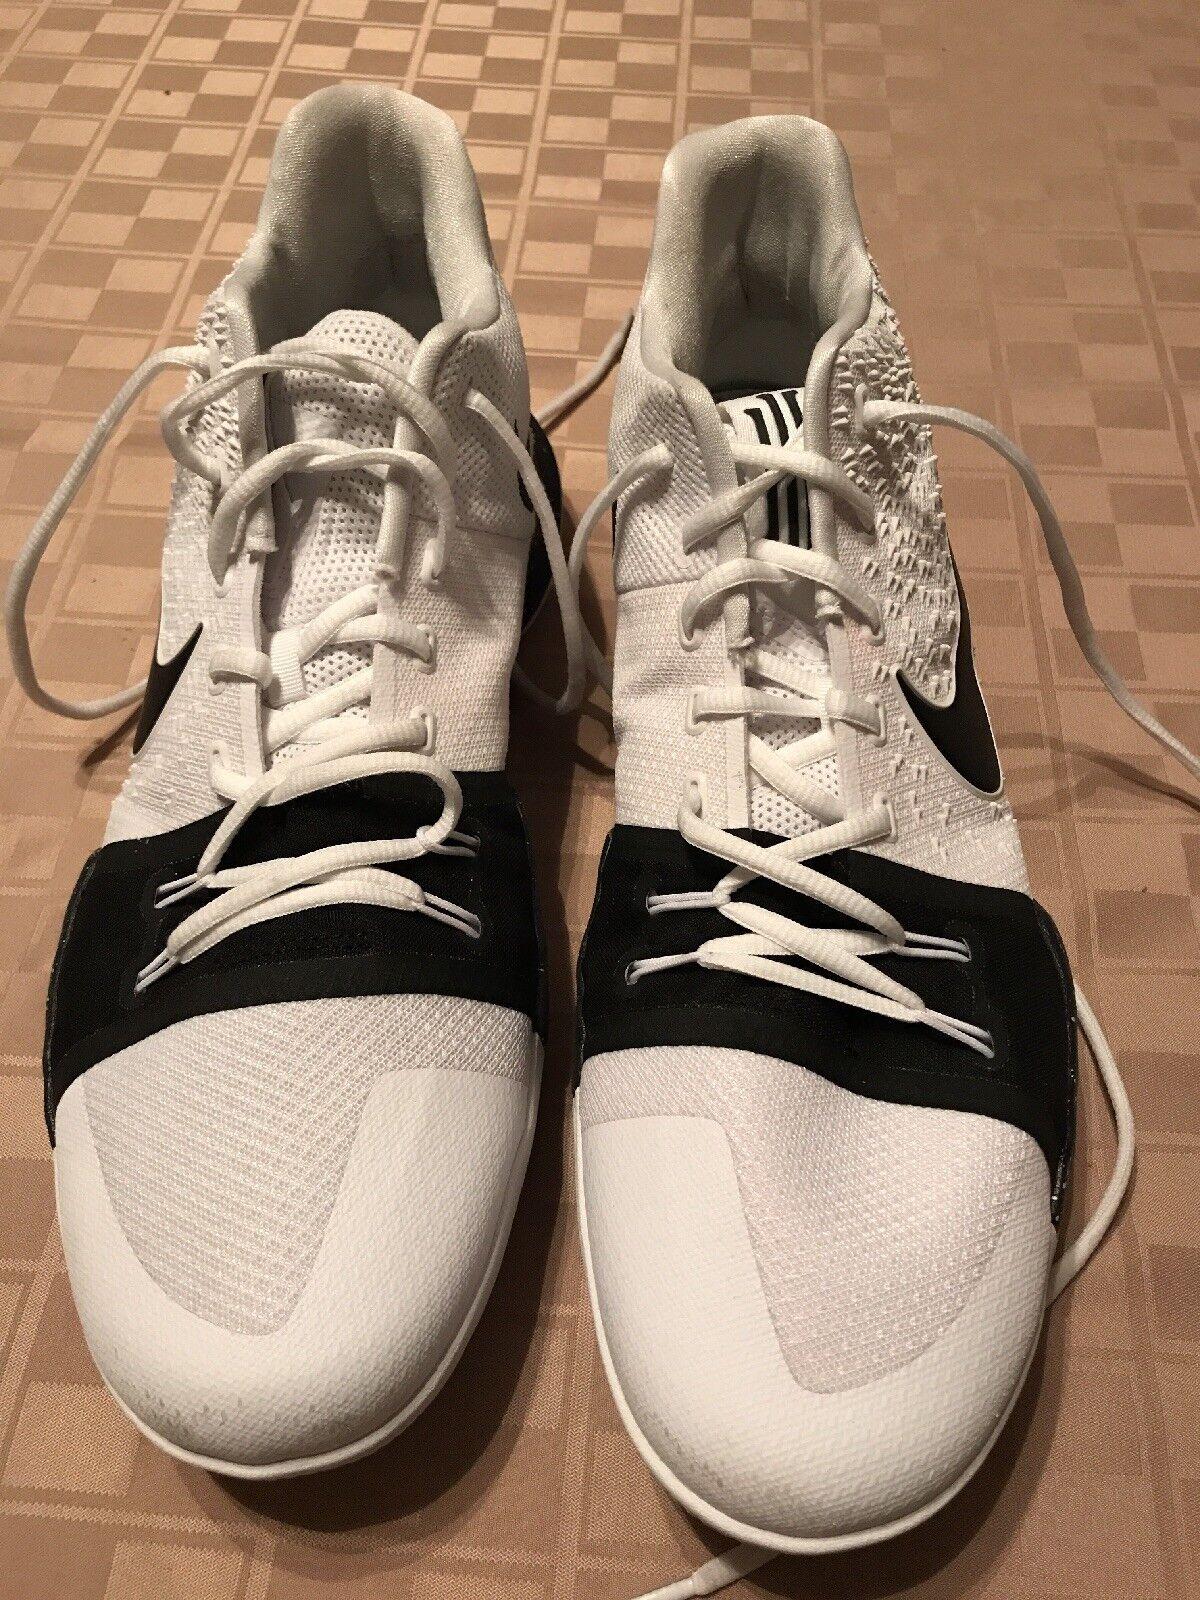 Men's Nike Kyrie 3 Basketball Shoes - White/Black Size 14 917724-100